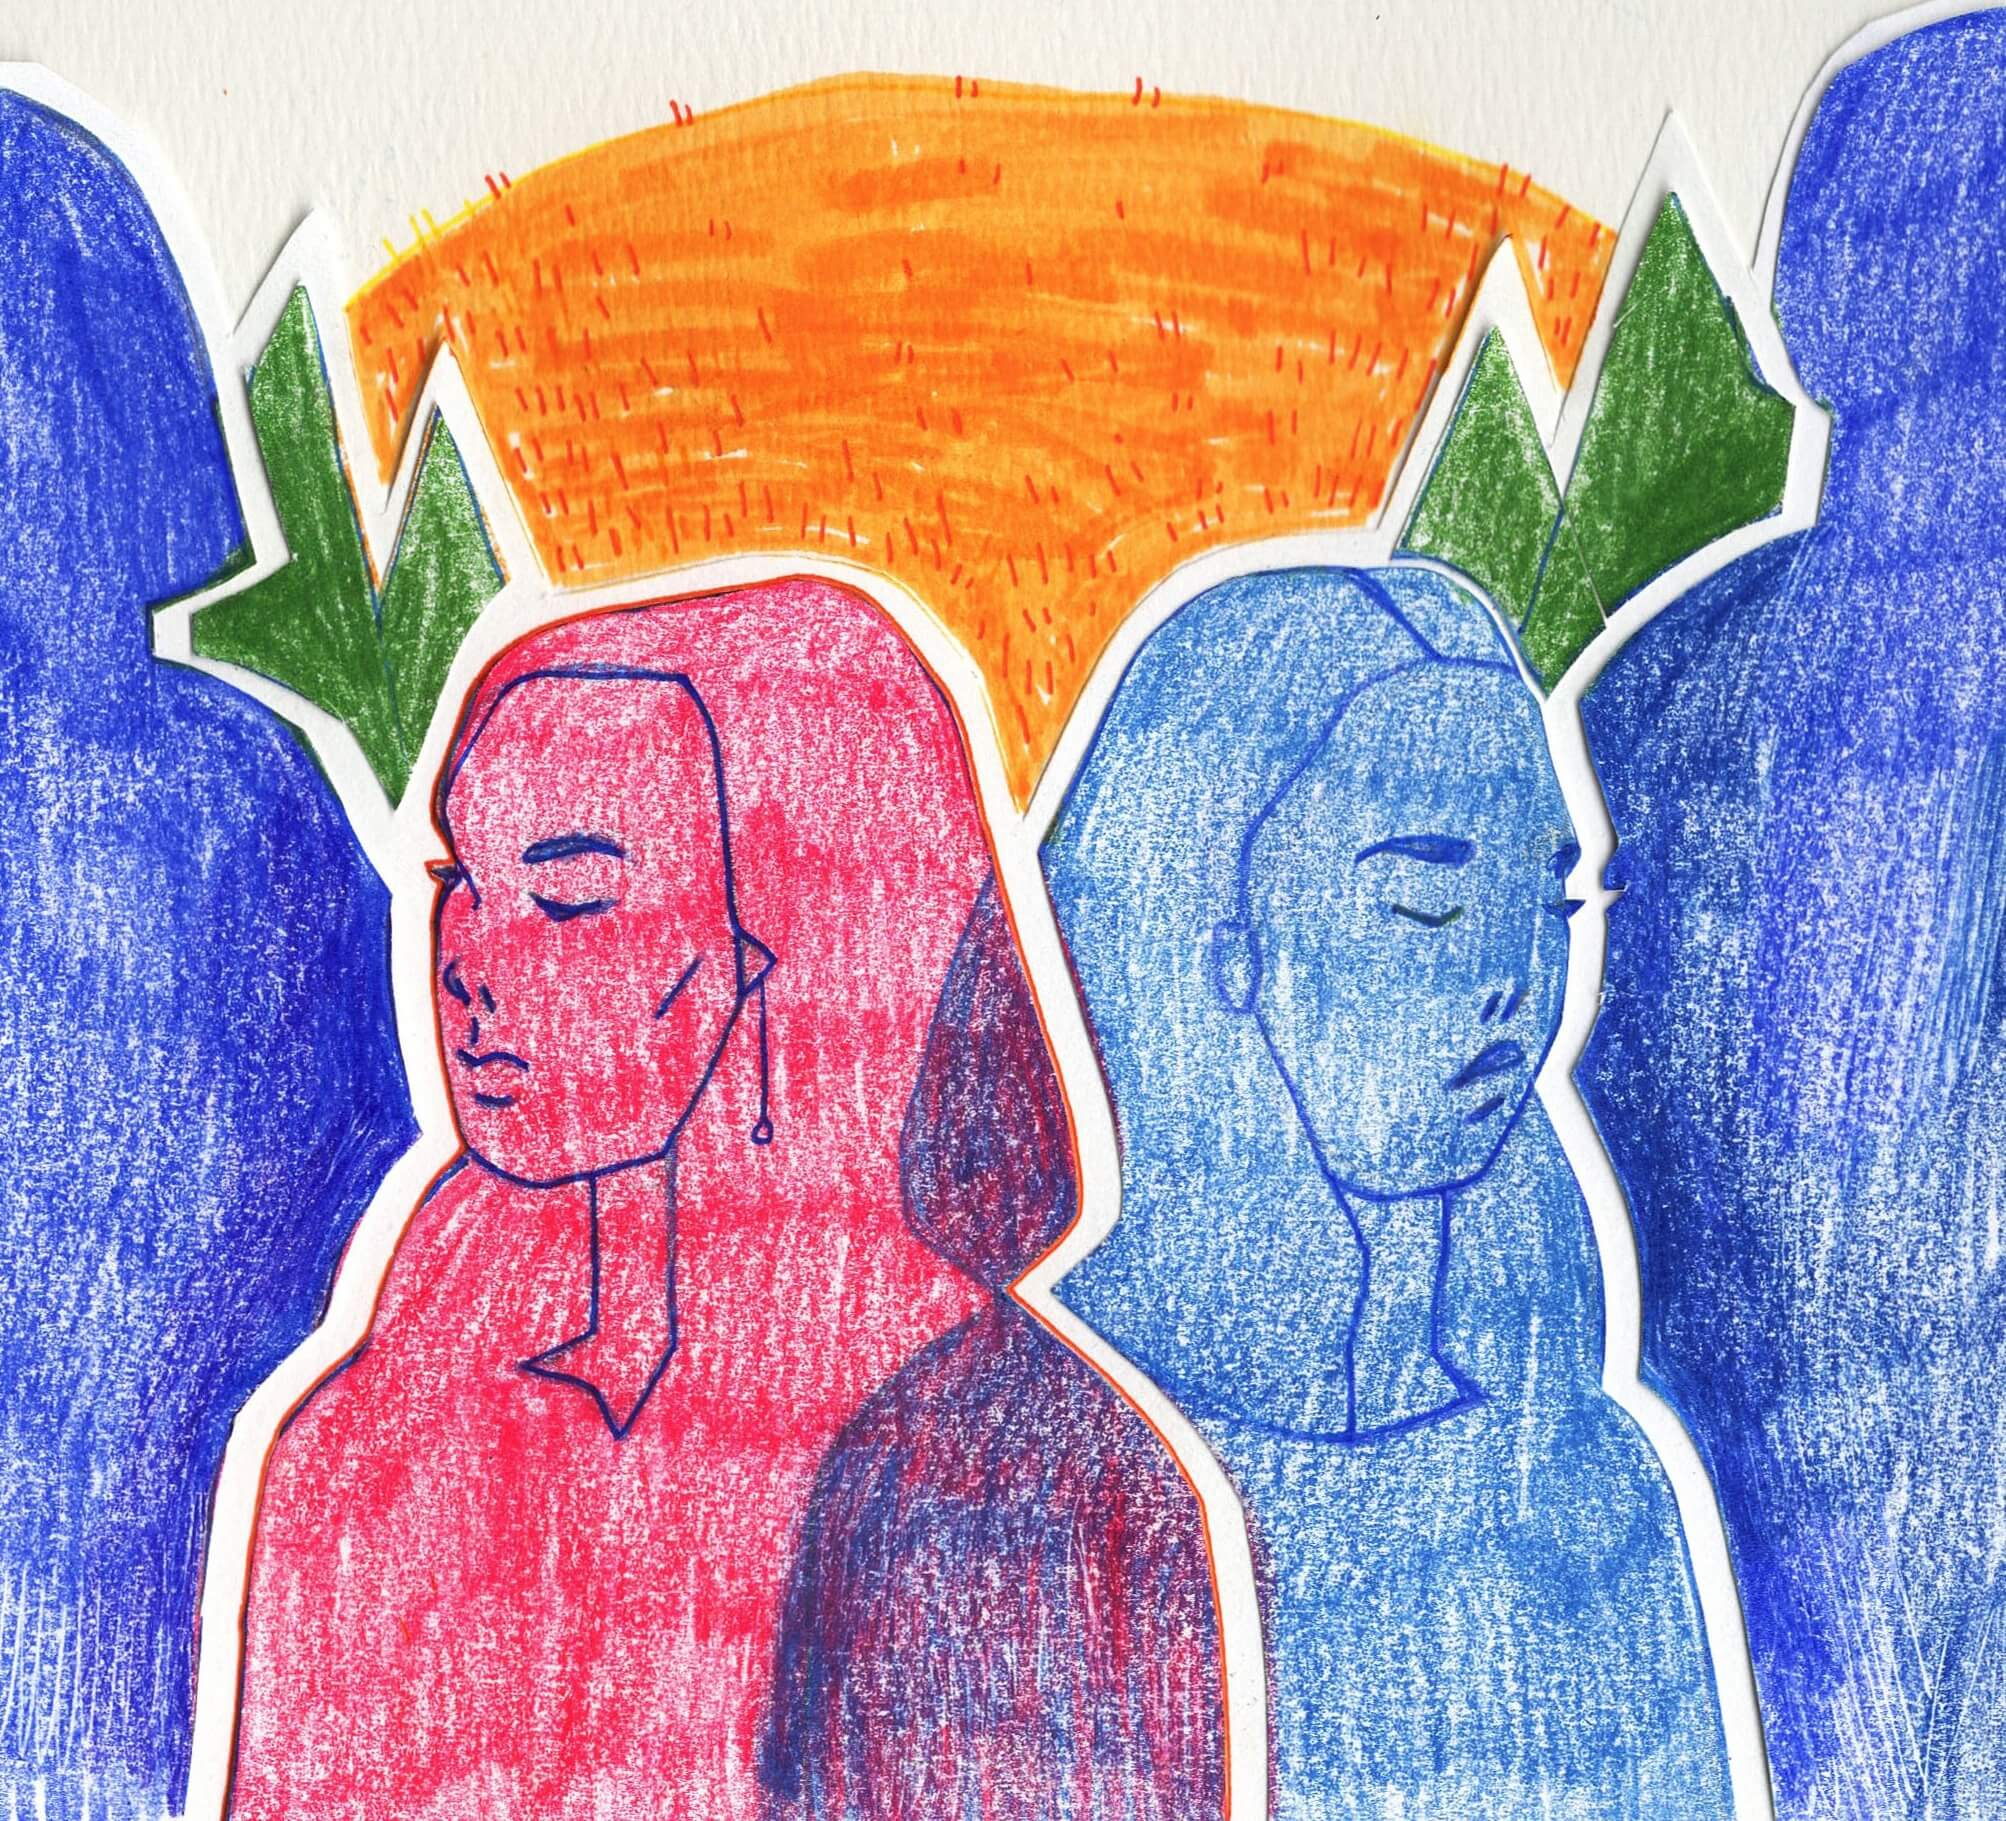 Illustration by Sendra Uebele.